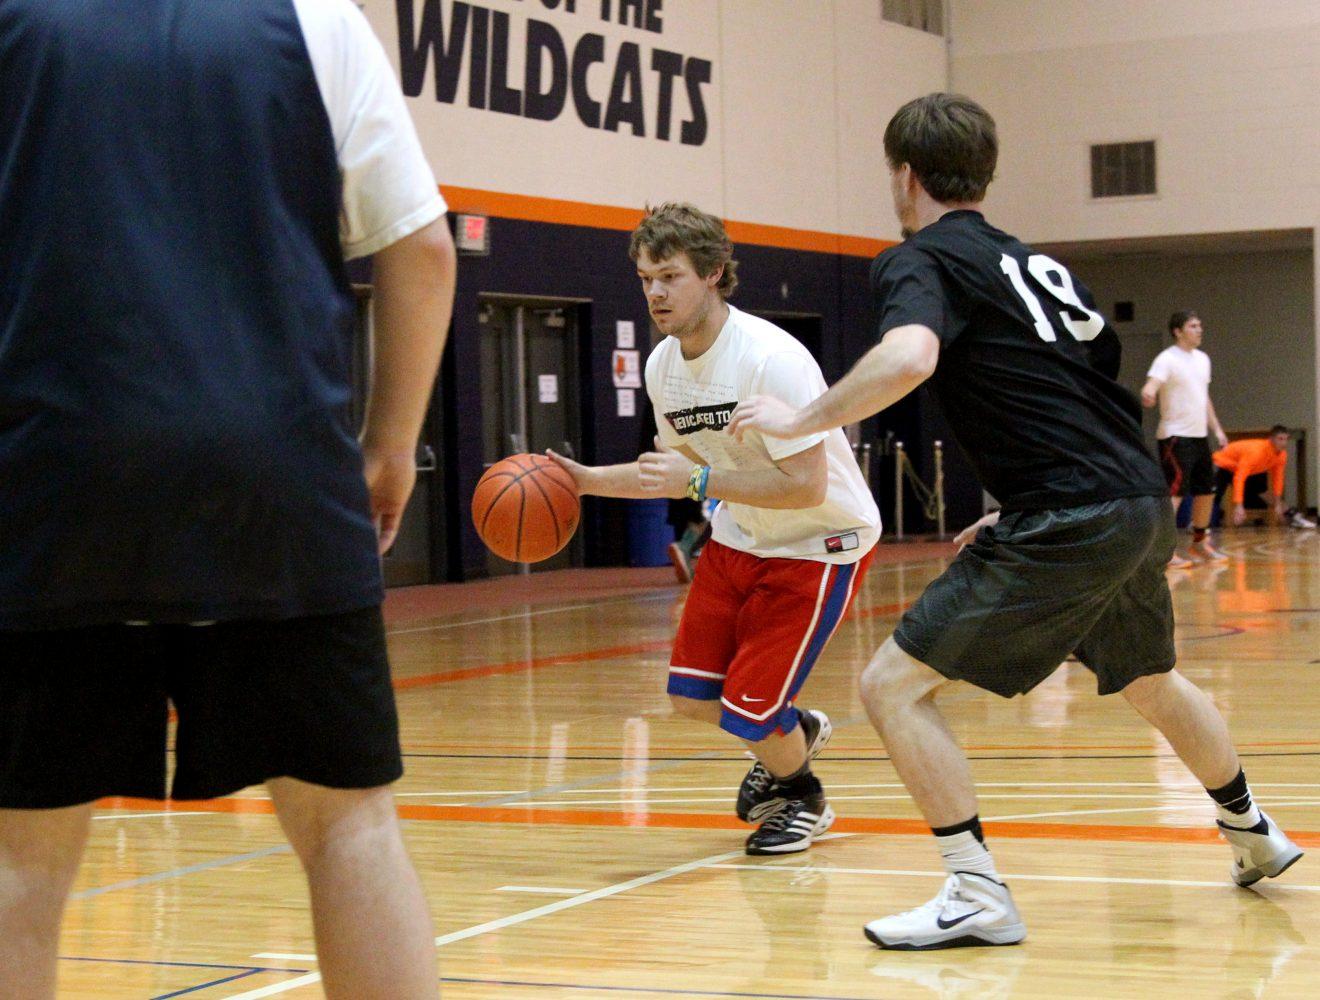 Intramural basketball picks up steam